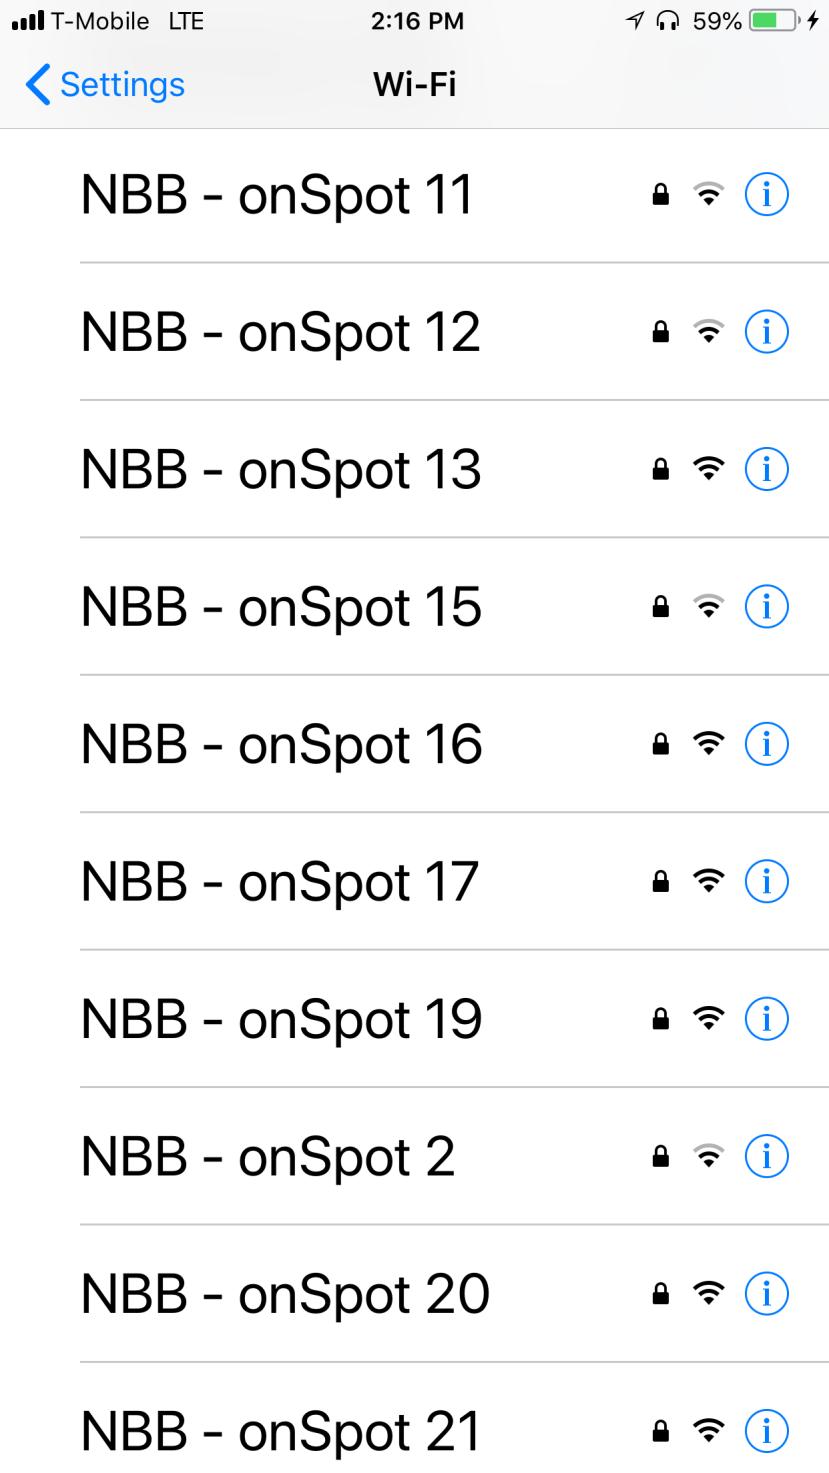 NBB WiFi